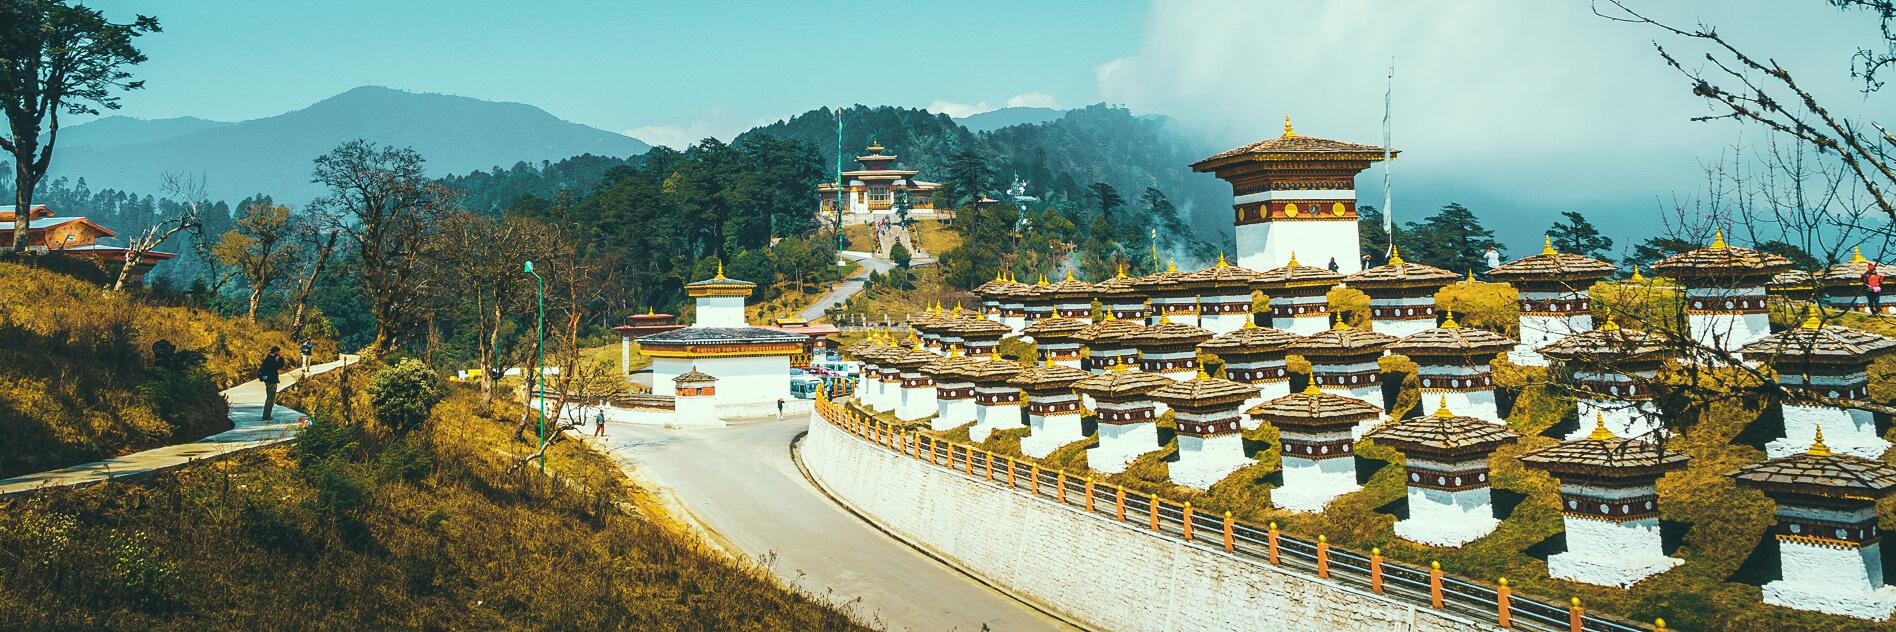 https://gody.vn/blog/duyle01006867/post/top-nhung-diem-du-lich-nhat-dinh-phai-tham-quan-khi-du-lich-bhutan-8845